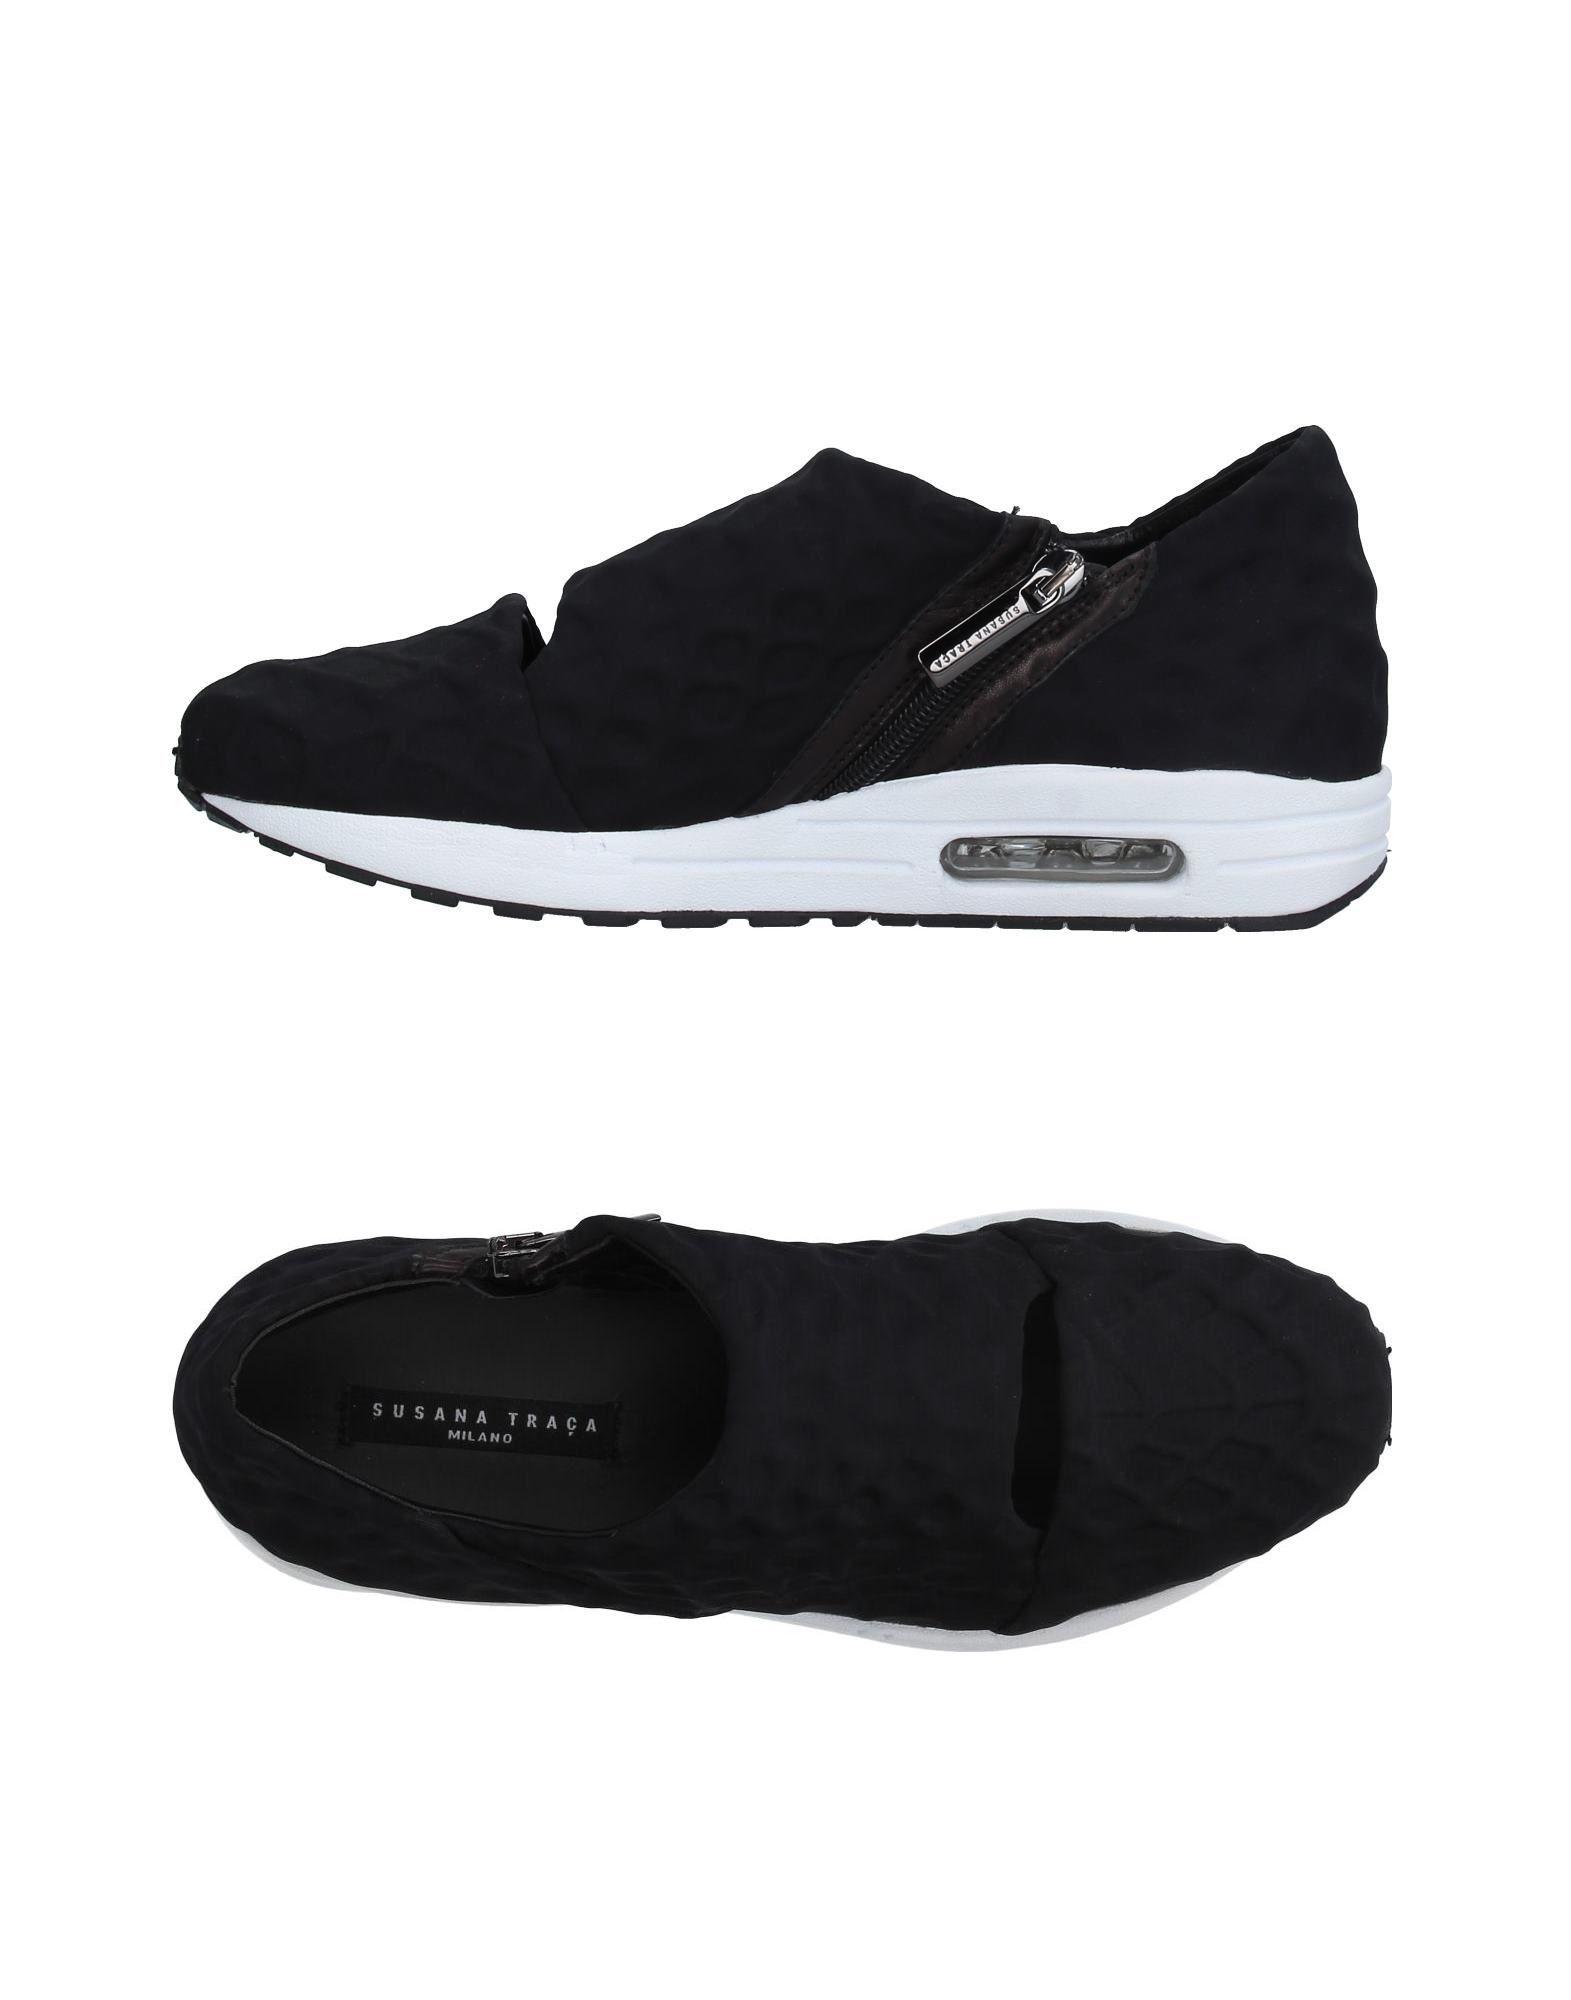 Susana Women Traca Sneakers - Women Susana Susana Traca Sneakers online on  Canada - 11227986BM d83ec6